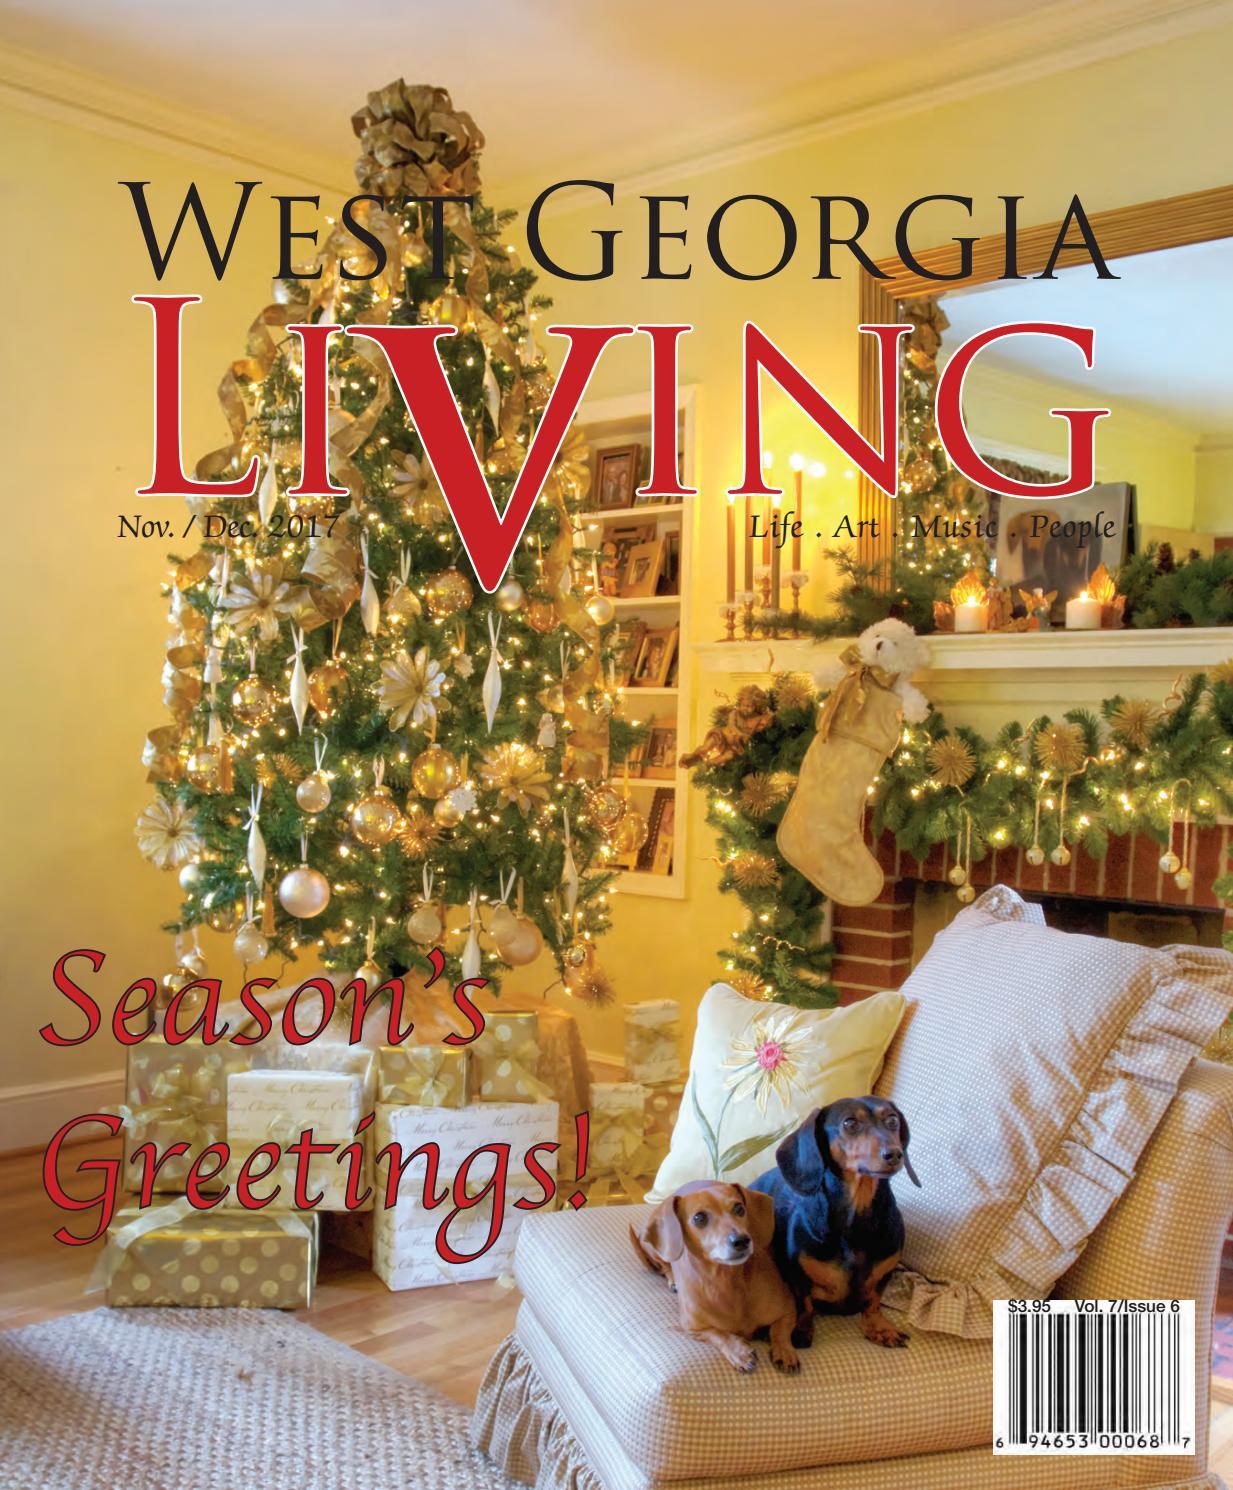 WGL November-December 2017 by Times-Georgian - issuu